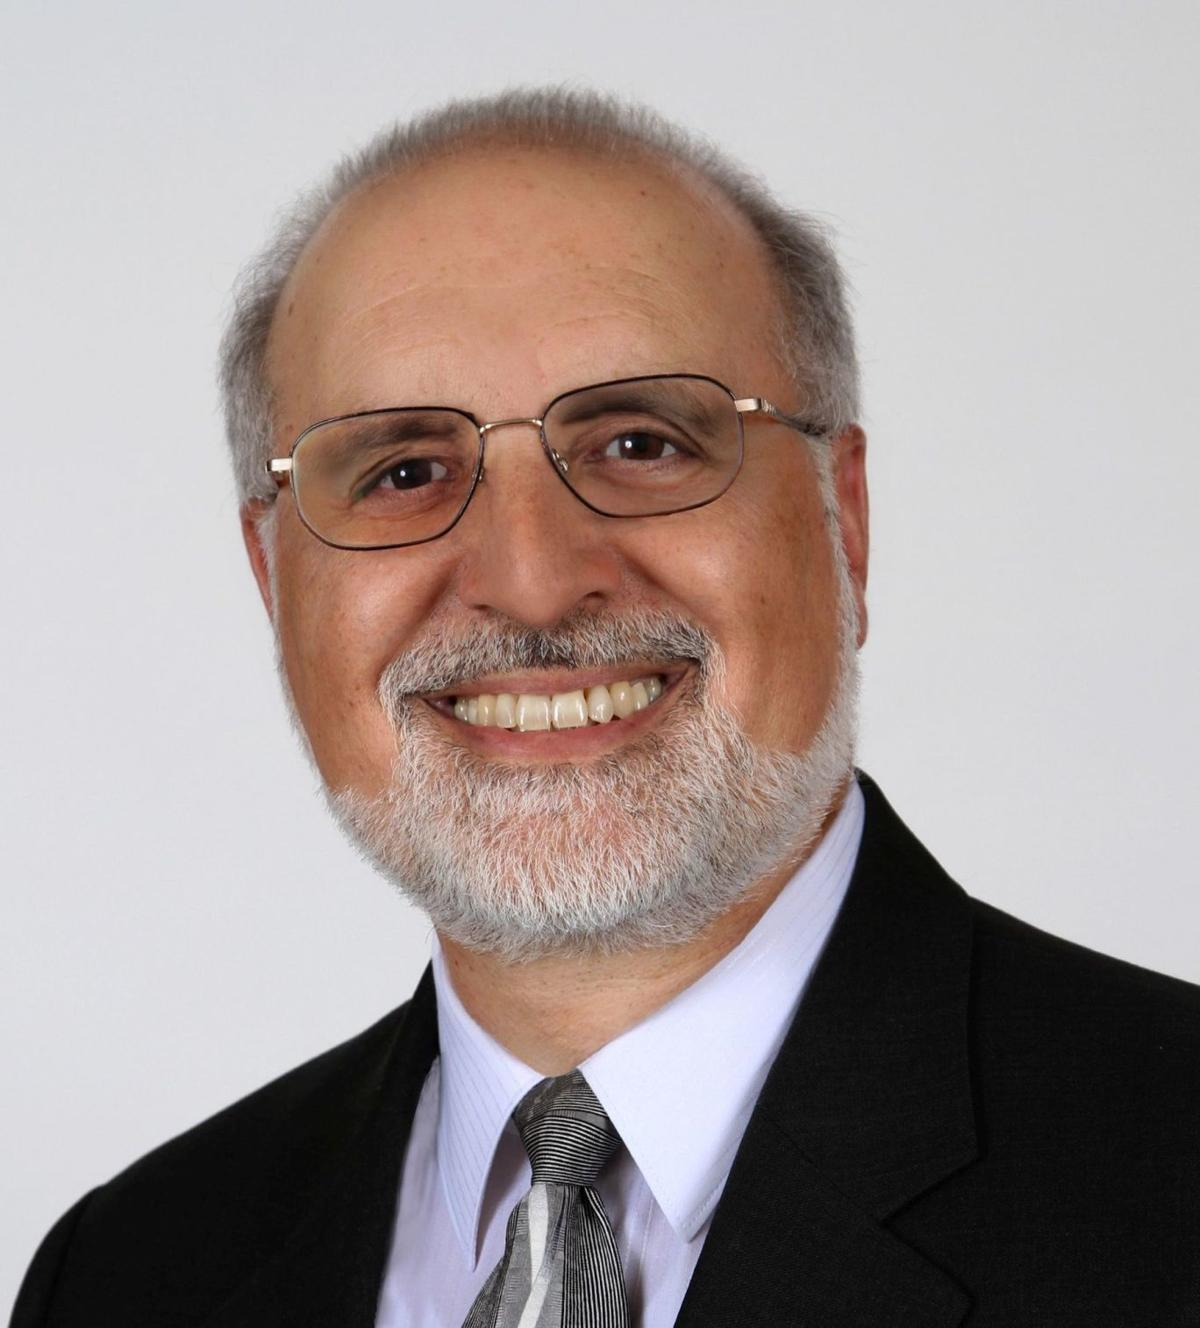 Mark Joseph (current headshot)